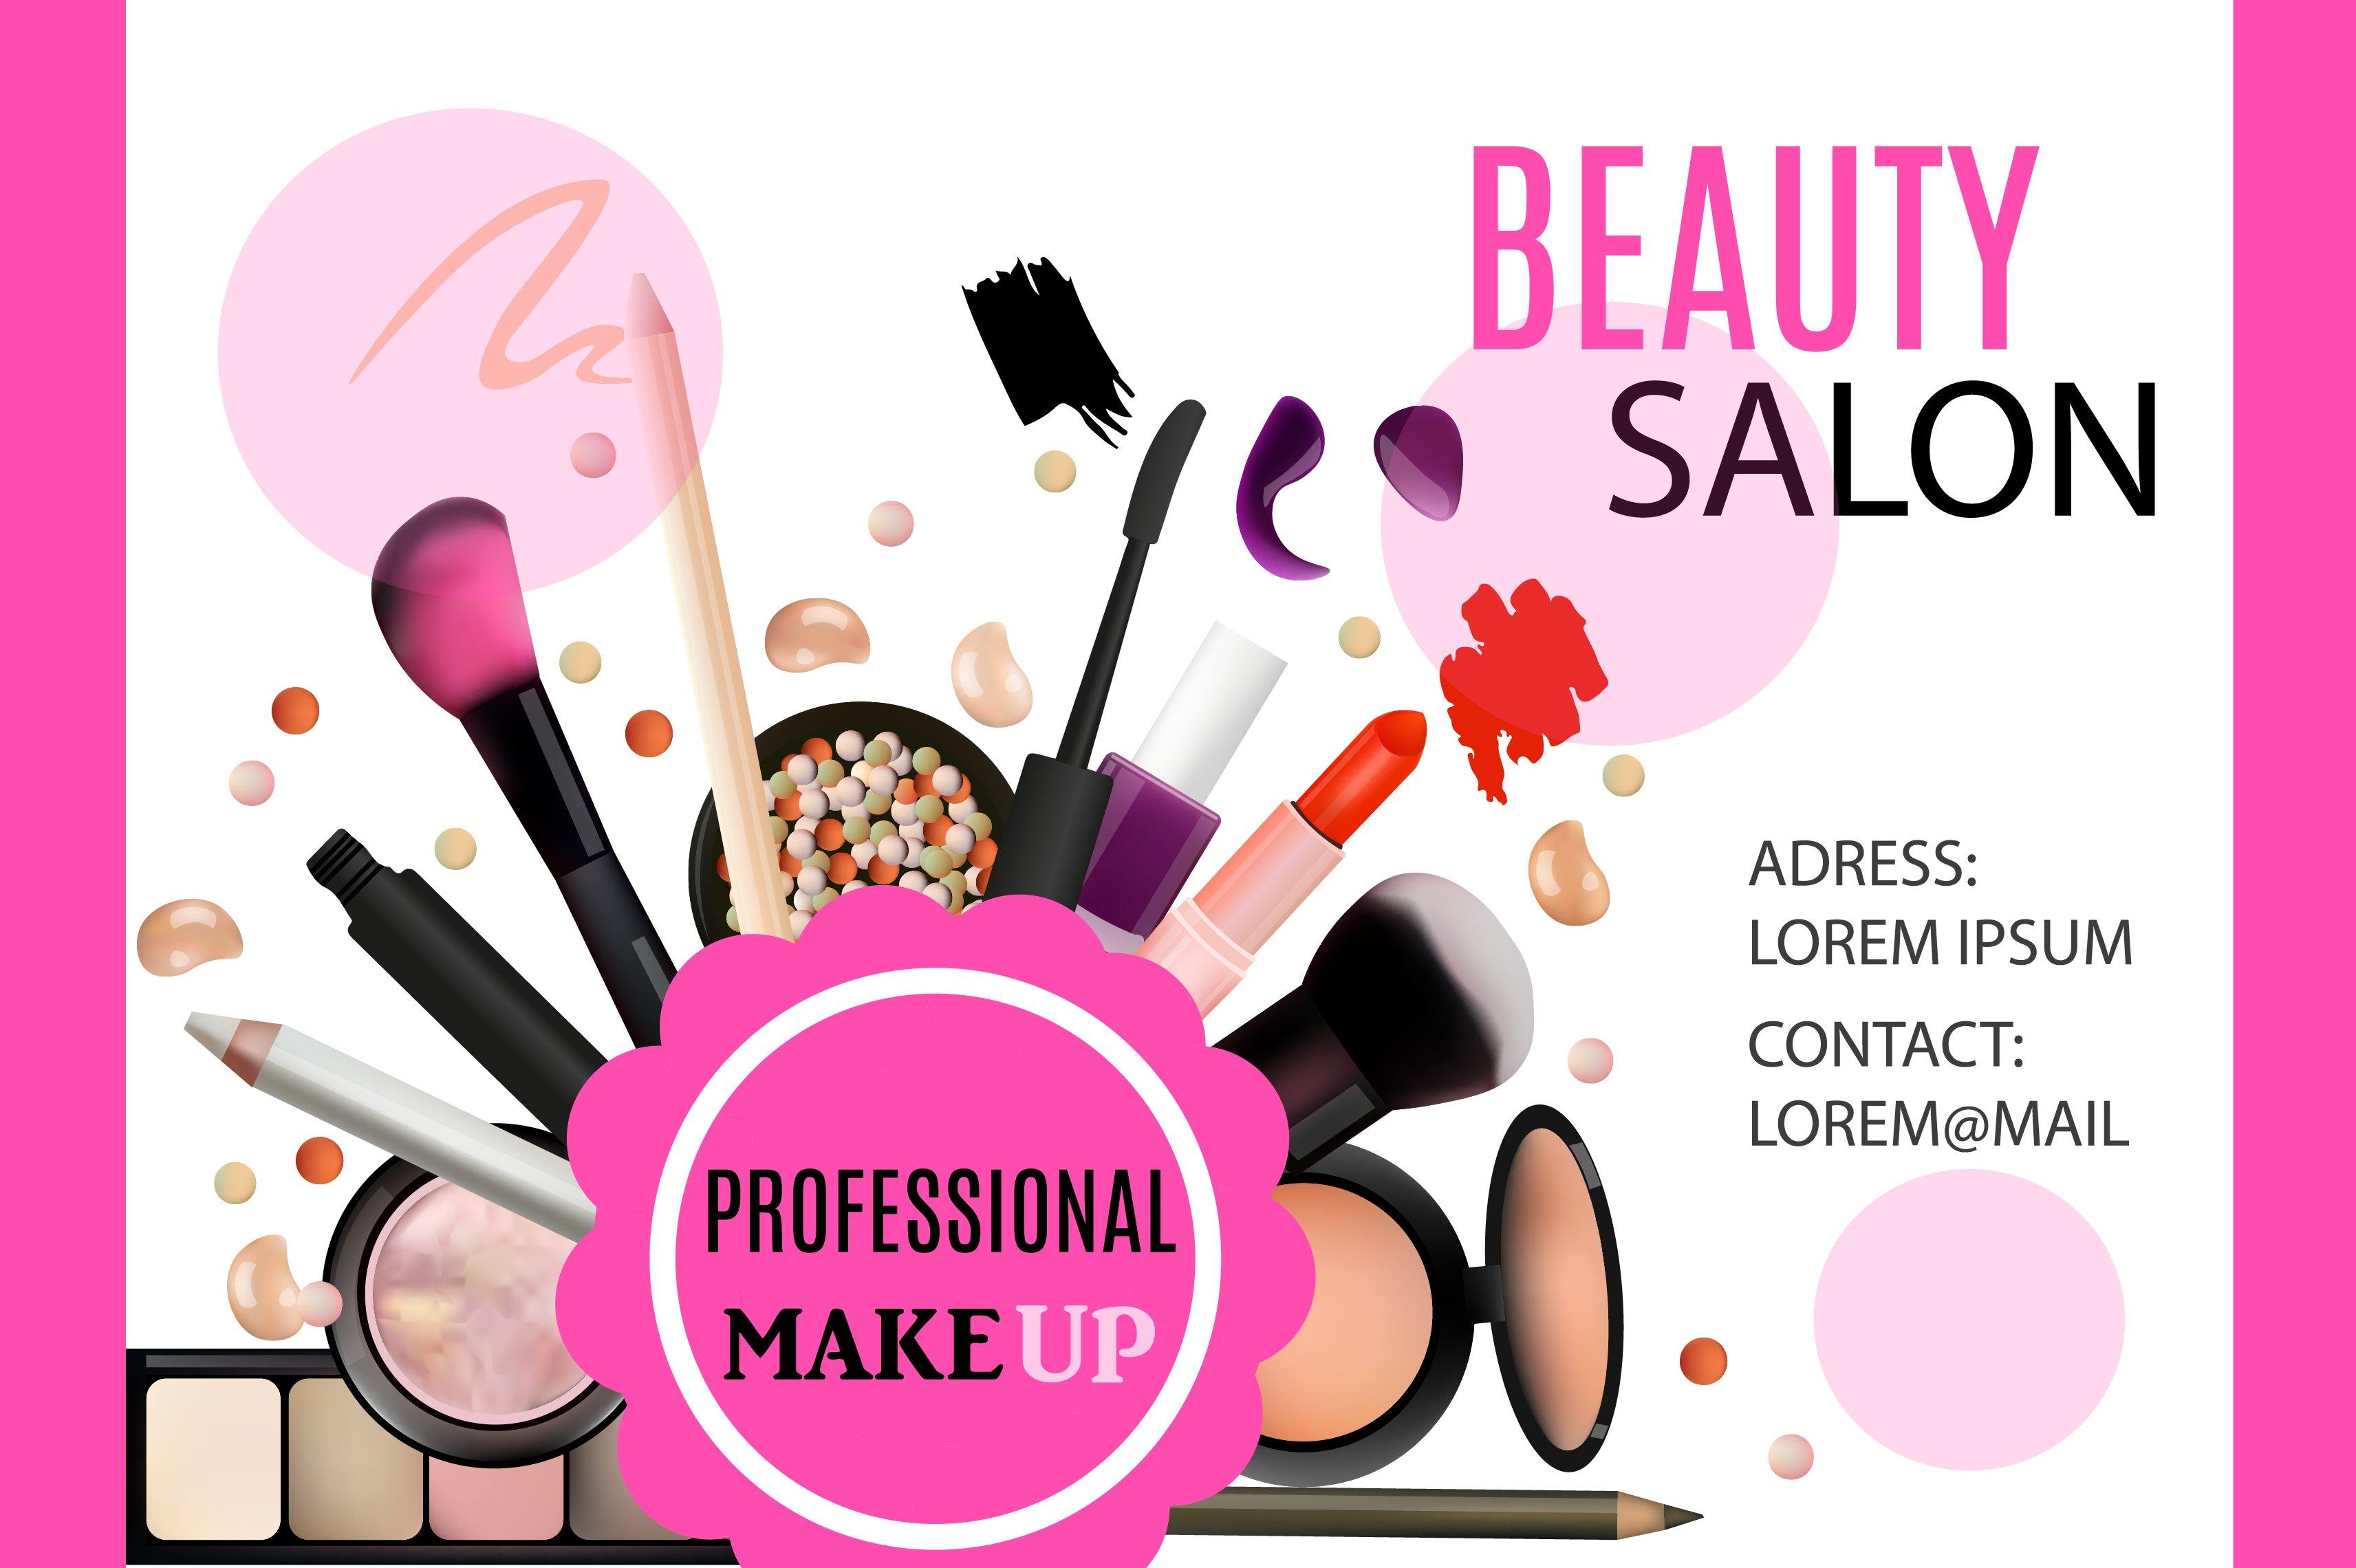 Beauty salon gift certificate template regular graph paper 100 beauty salon gift certificate template free 443 best kosmetic 023 11 beauty salon yelopaper Choice Image